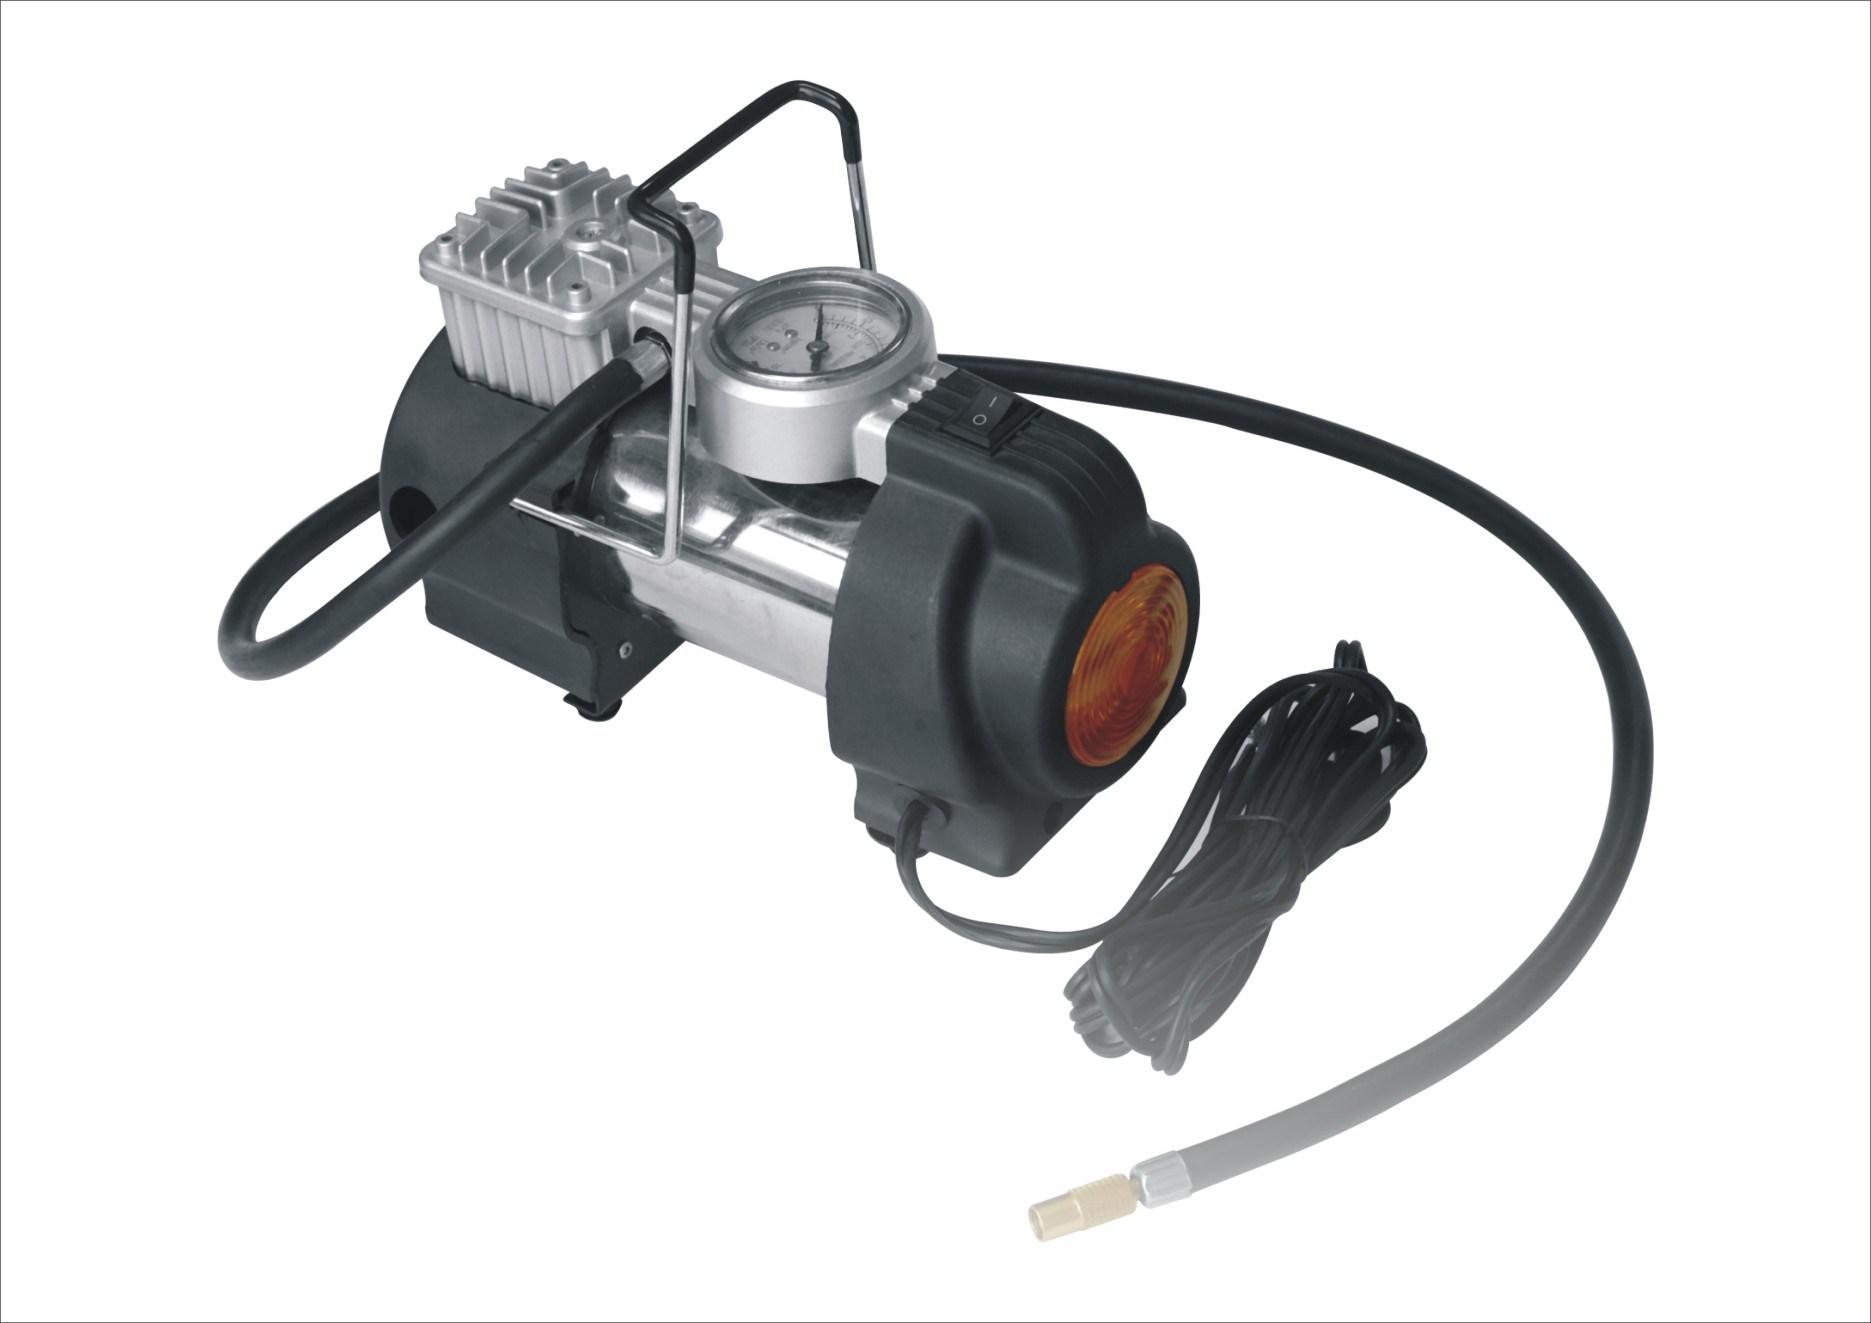 DC12V/24V 100psi Mini Air Compressor for Car